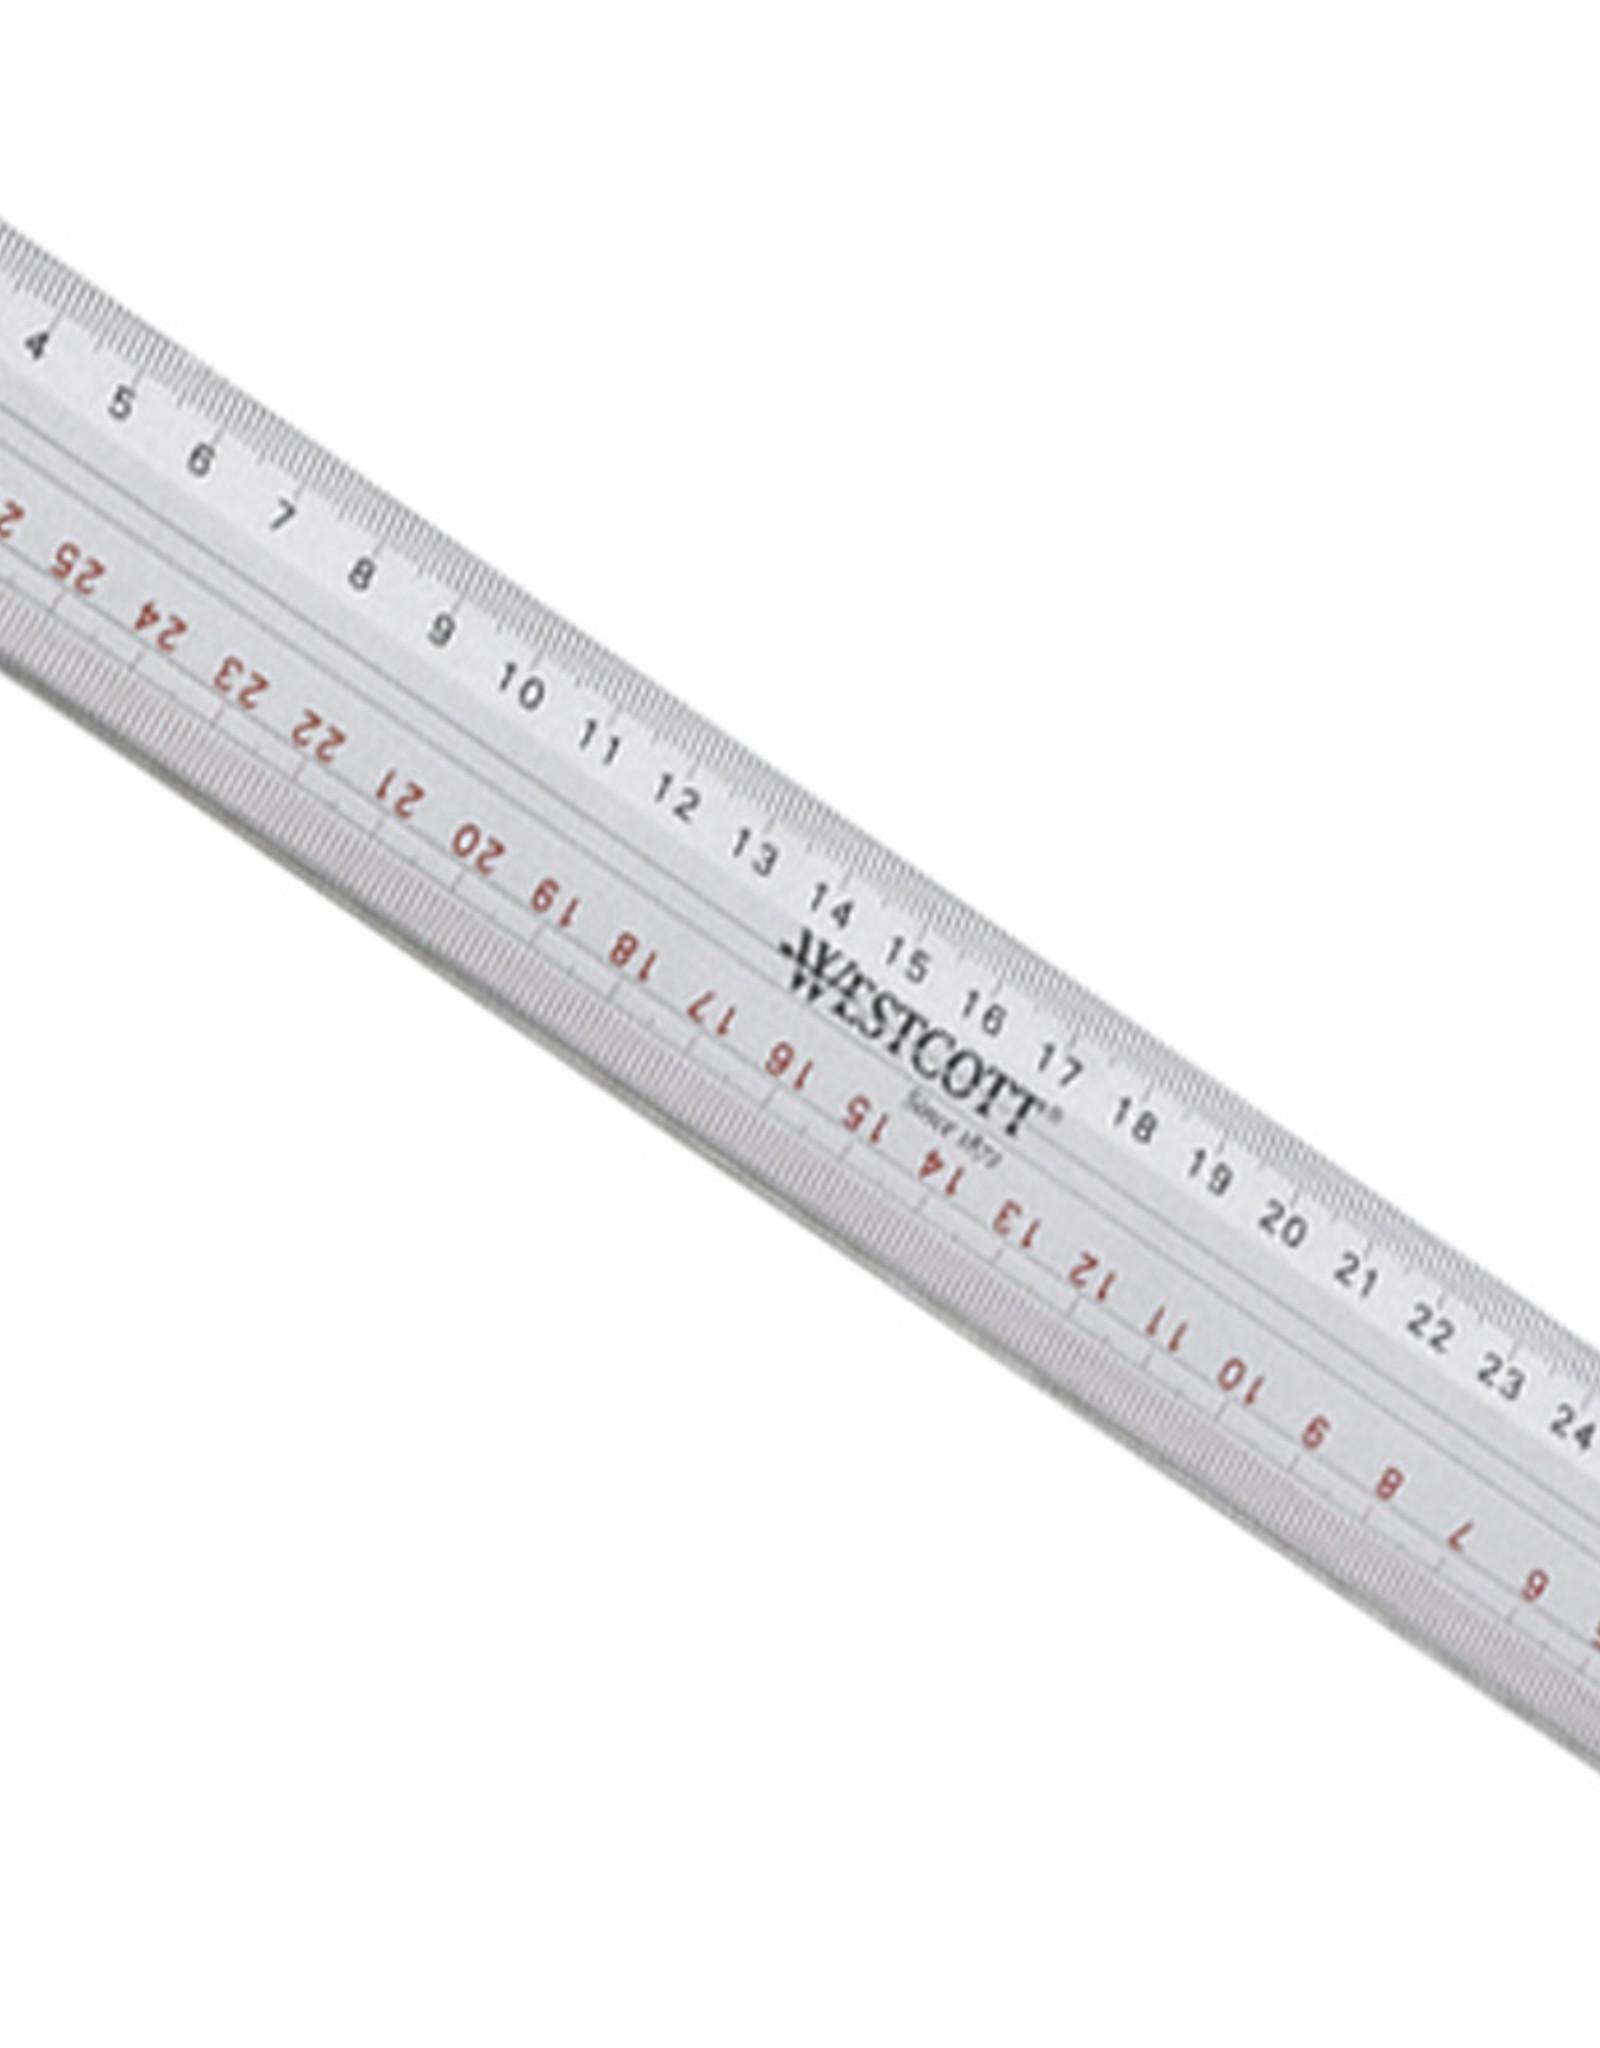 westcott Liniaal Aluminium Westcott met Anti Slip Rubberlaag 30 cm